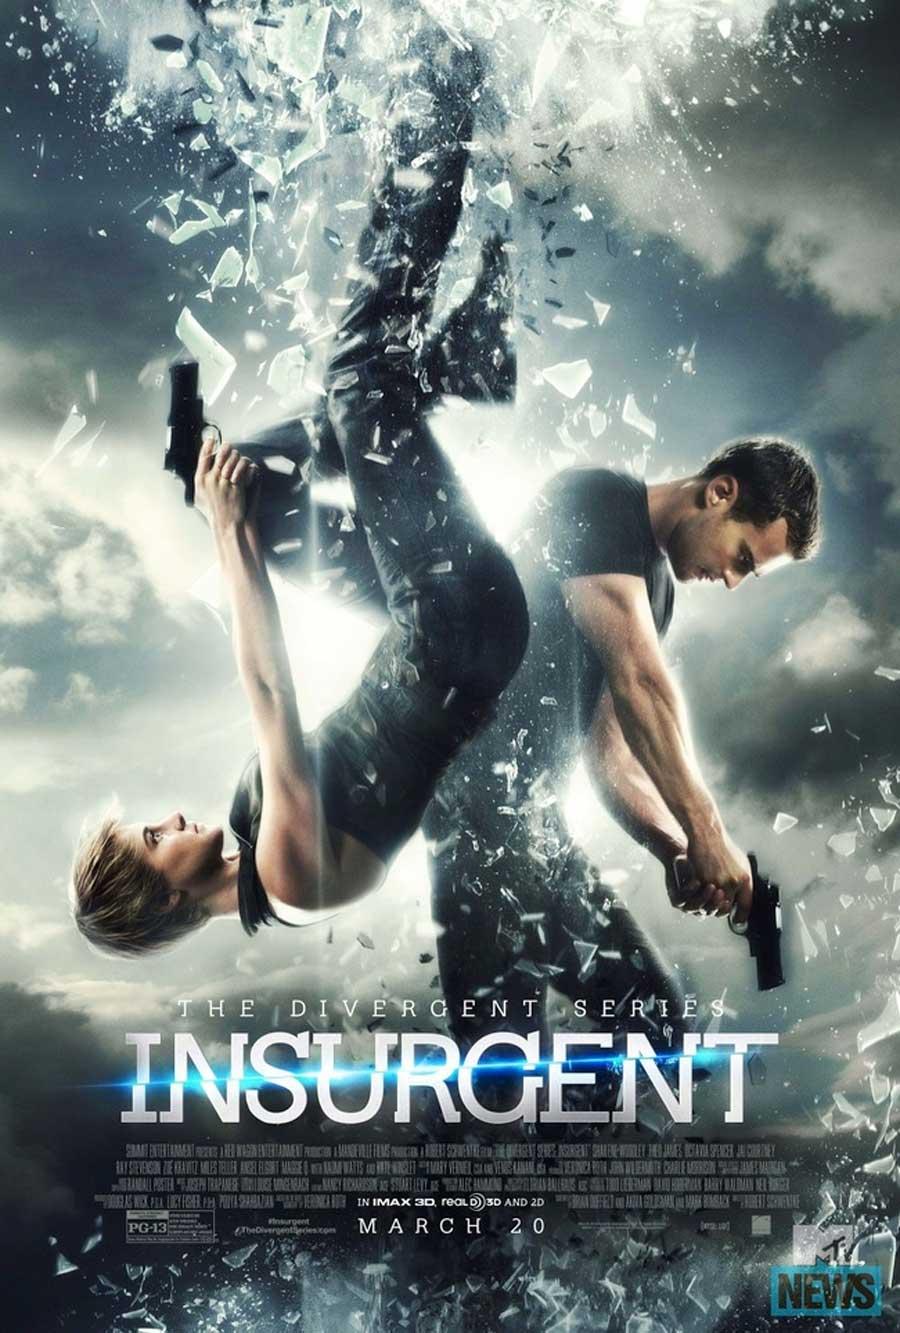 Poster for Insurgent